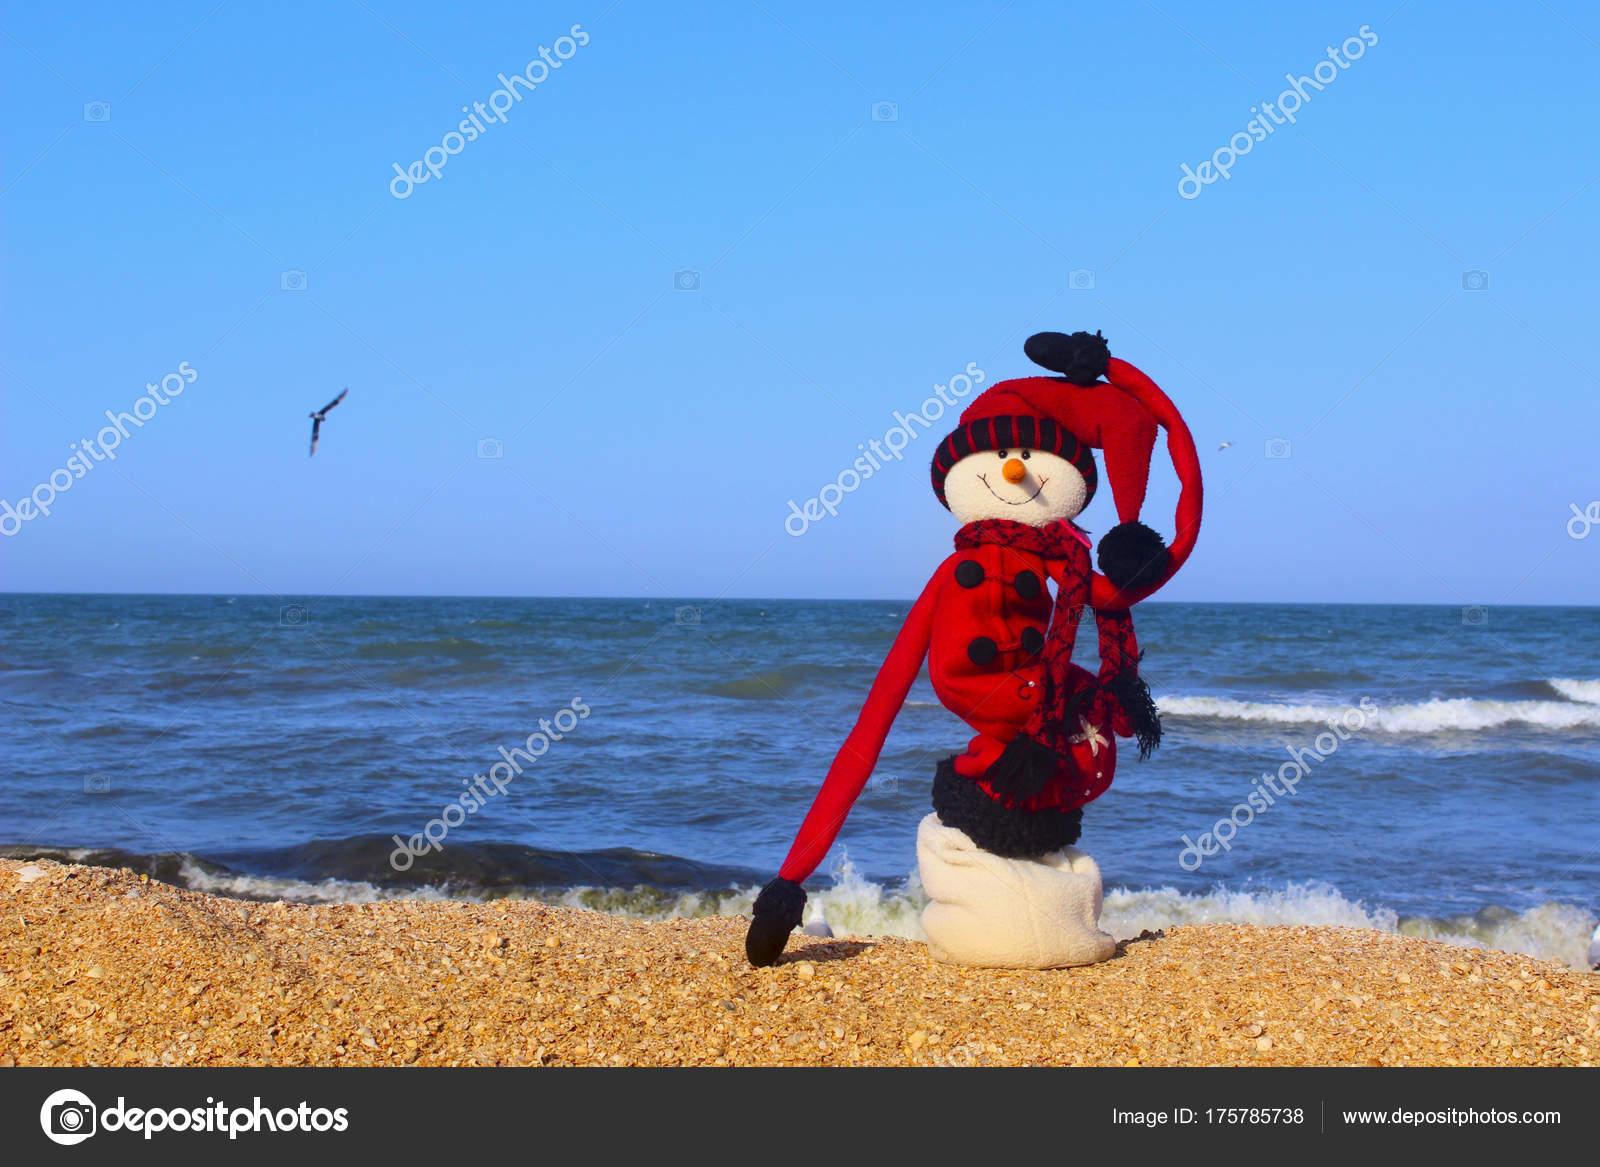 9218fdad72bf Χριστούγεννα Ταξίδια Διακοπές Concept Snowman Στα Κόκκινα Ρούχα Στέκεται  Χιονάνθρωπος — Φωτογραφία Αρχείου